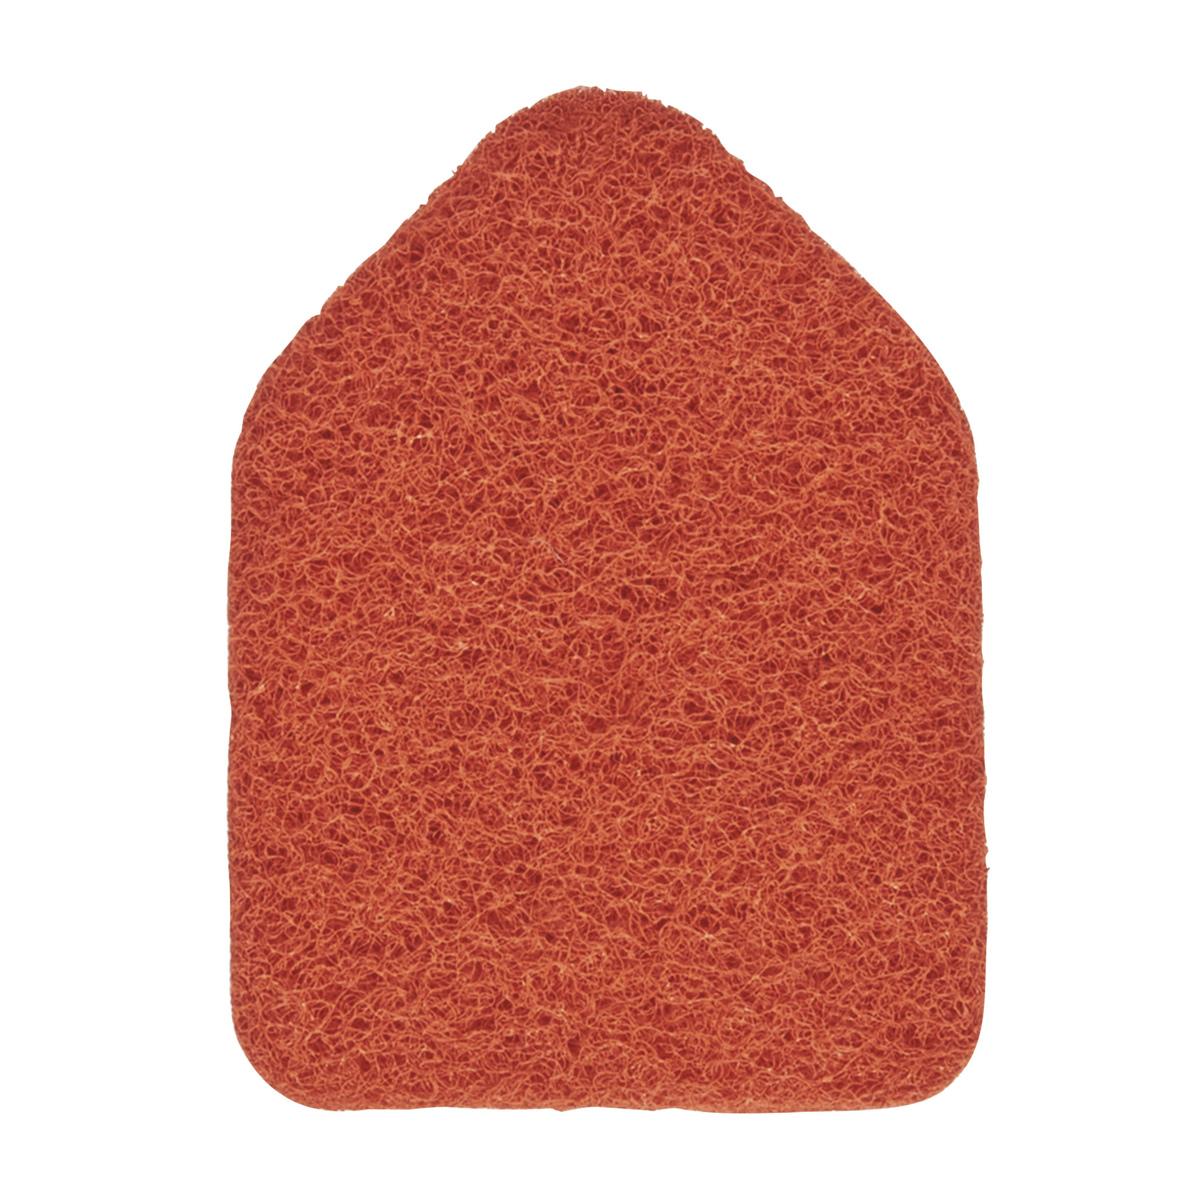 Онлайн каталог PROMENU: Насадка для щетки сменная OXO CLEANING, 3х12х25 см, красный                                   12133800